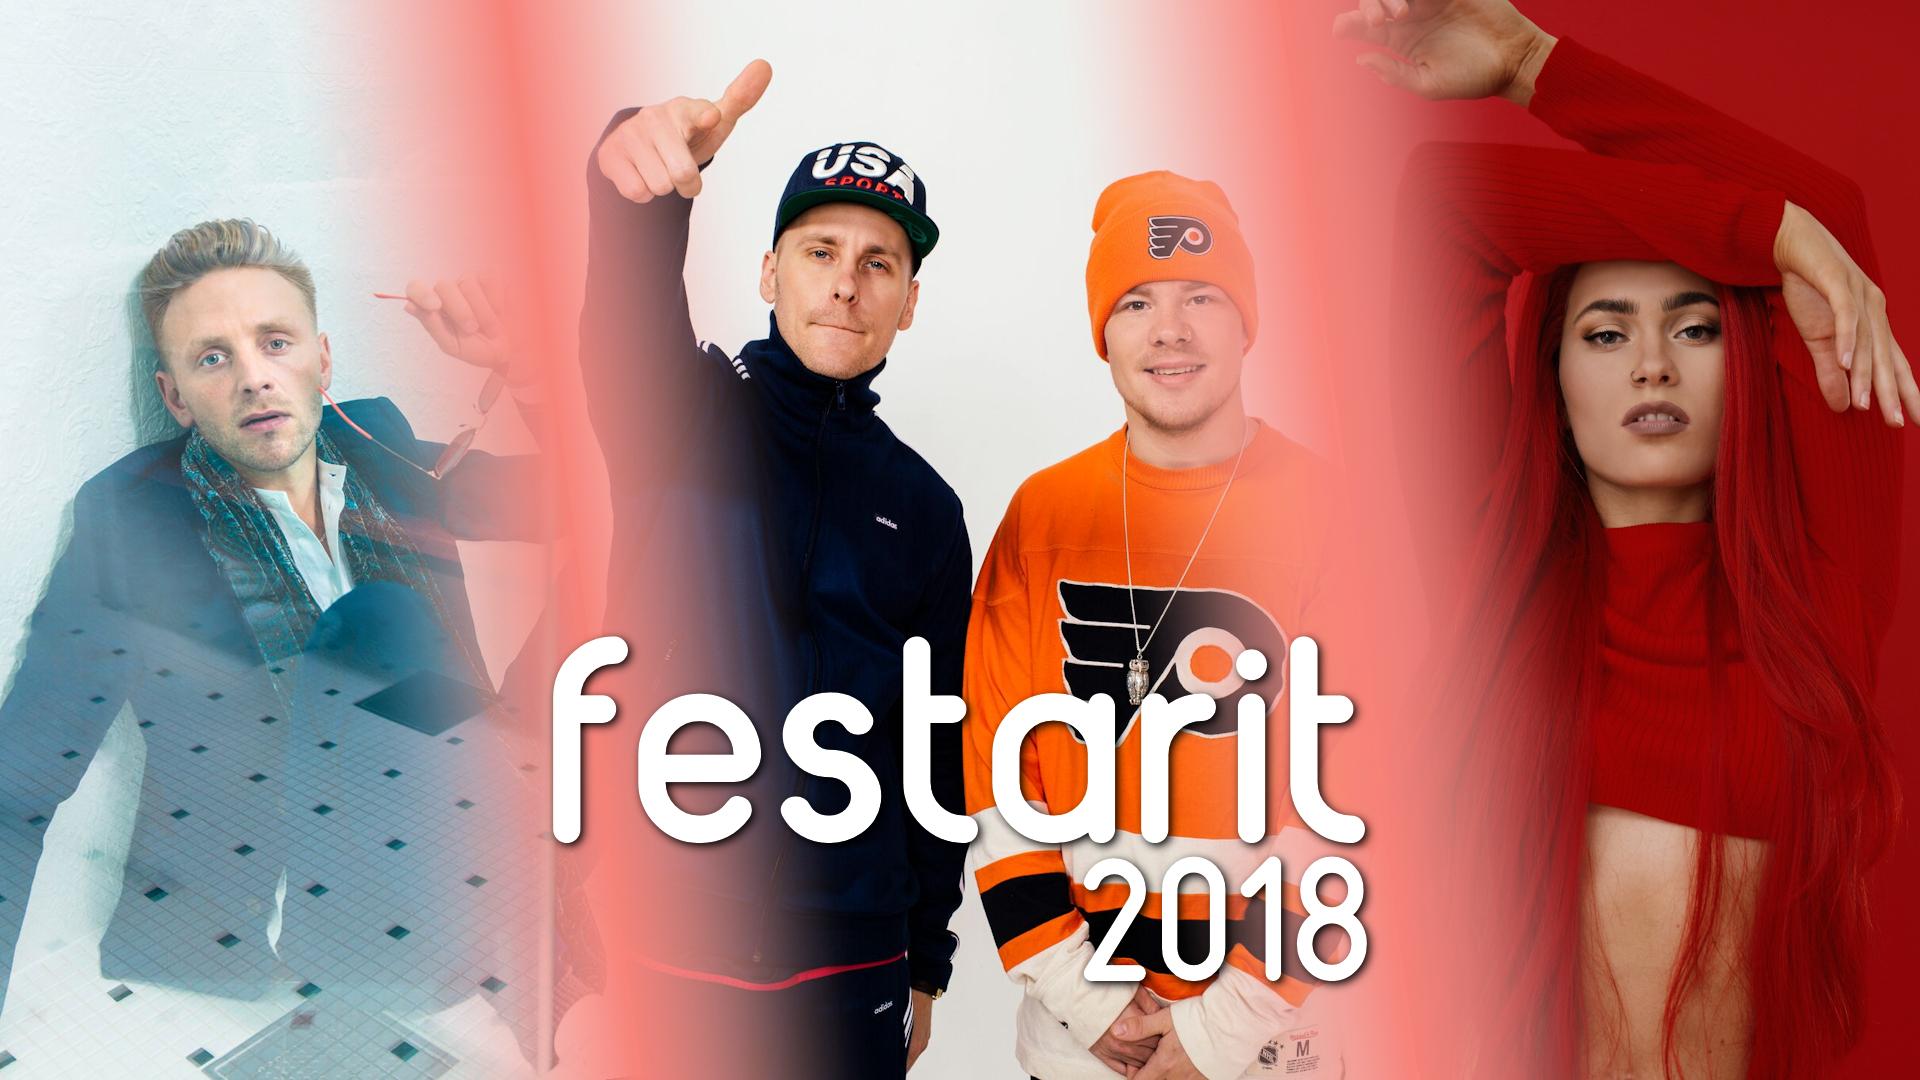 Reino Nordin Pohjois-Suomen festarikuningas!